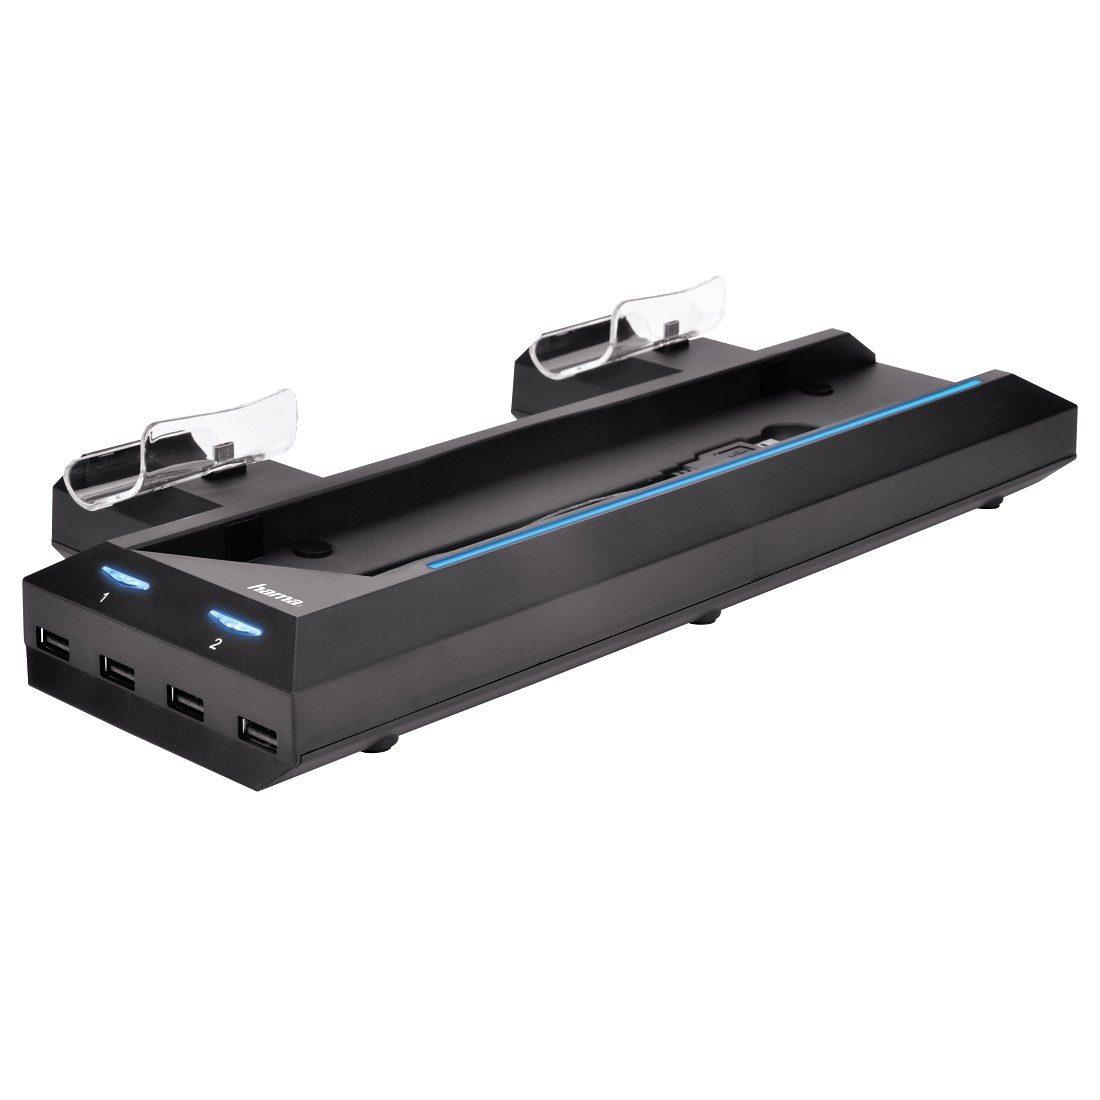 Hama Multistand Bluelight für PS4, Ladestation für 2 Controller »vertikaler Standfuß, USB Hub«